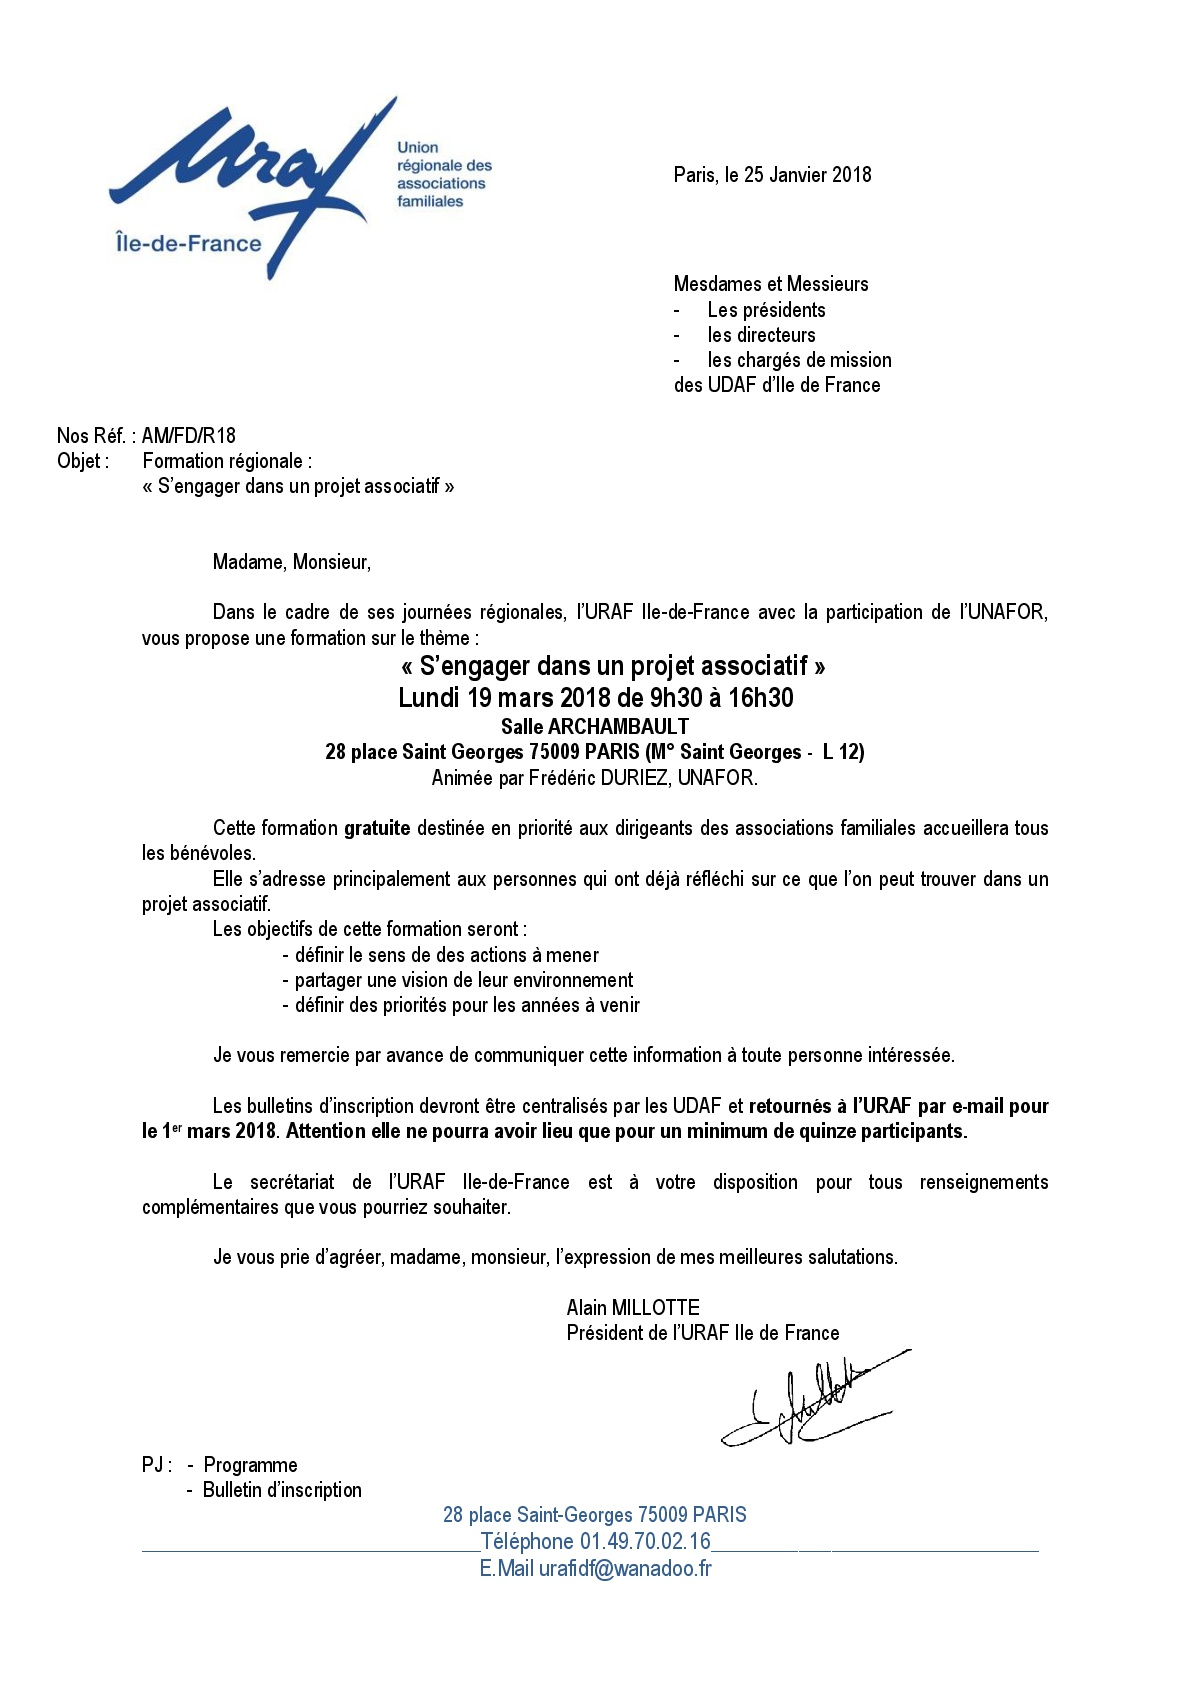 19 Mars 2018 Formation Uraf S Engager Dans Un Projet Associatif